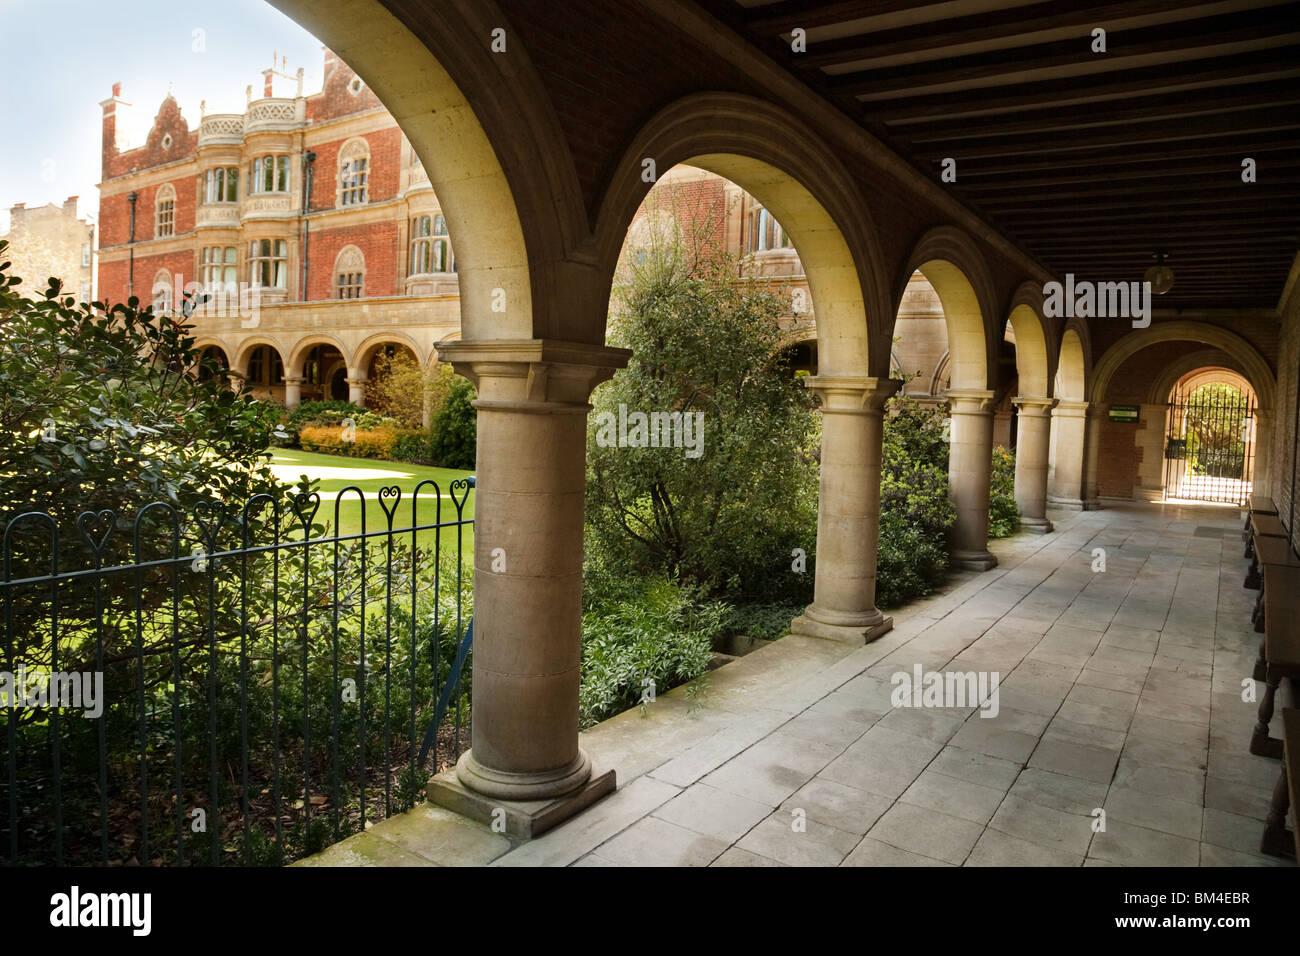 Cloister Court, Sidney Sussex college Cambridge University, Cambridge UK - Stock Image